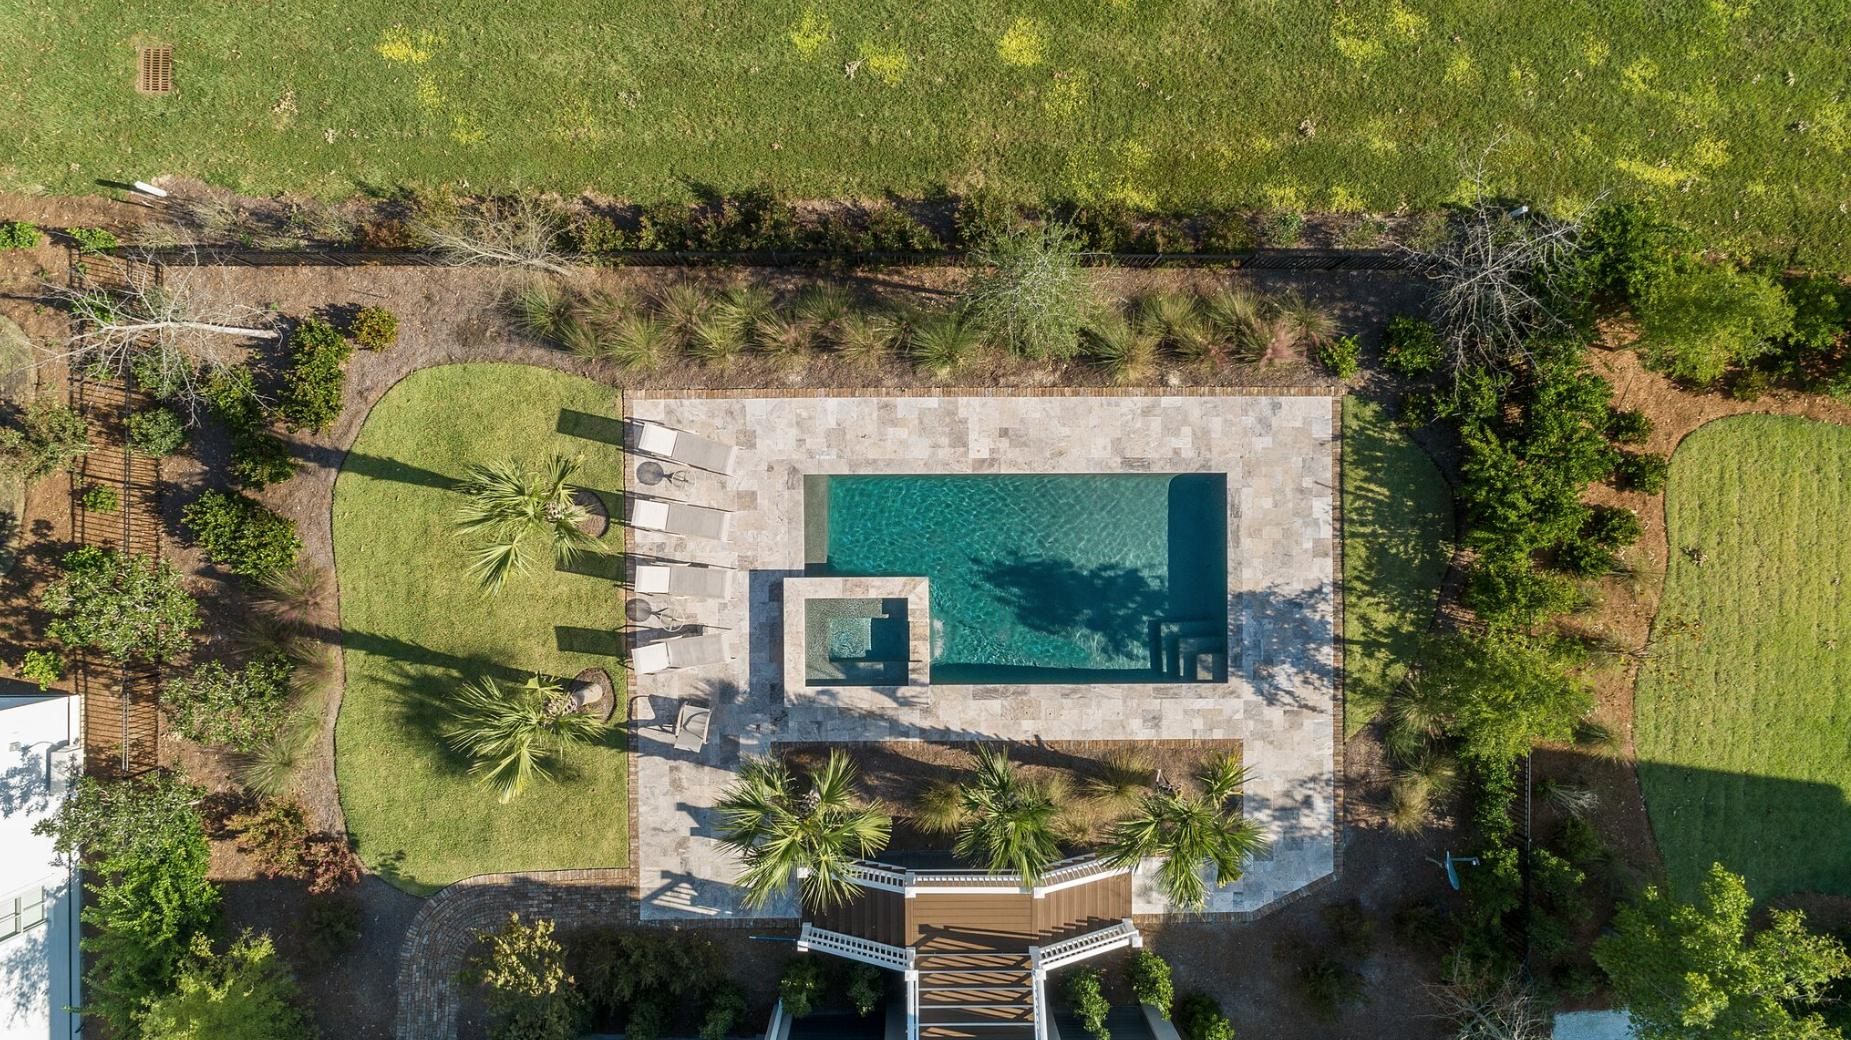 Daniel Island Homes For Sale - 107 Brailsford, Charleston, SC - 6